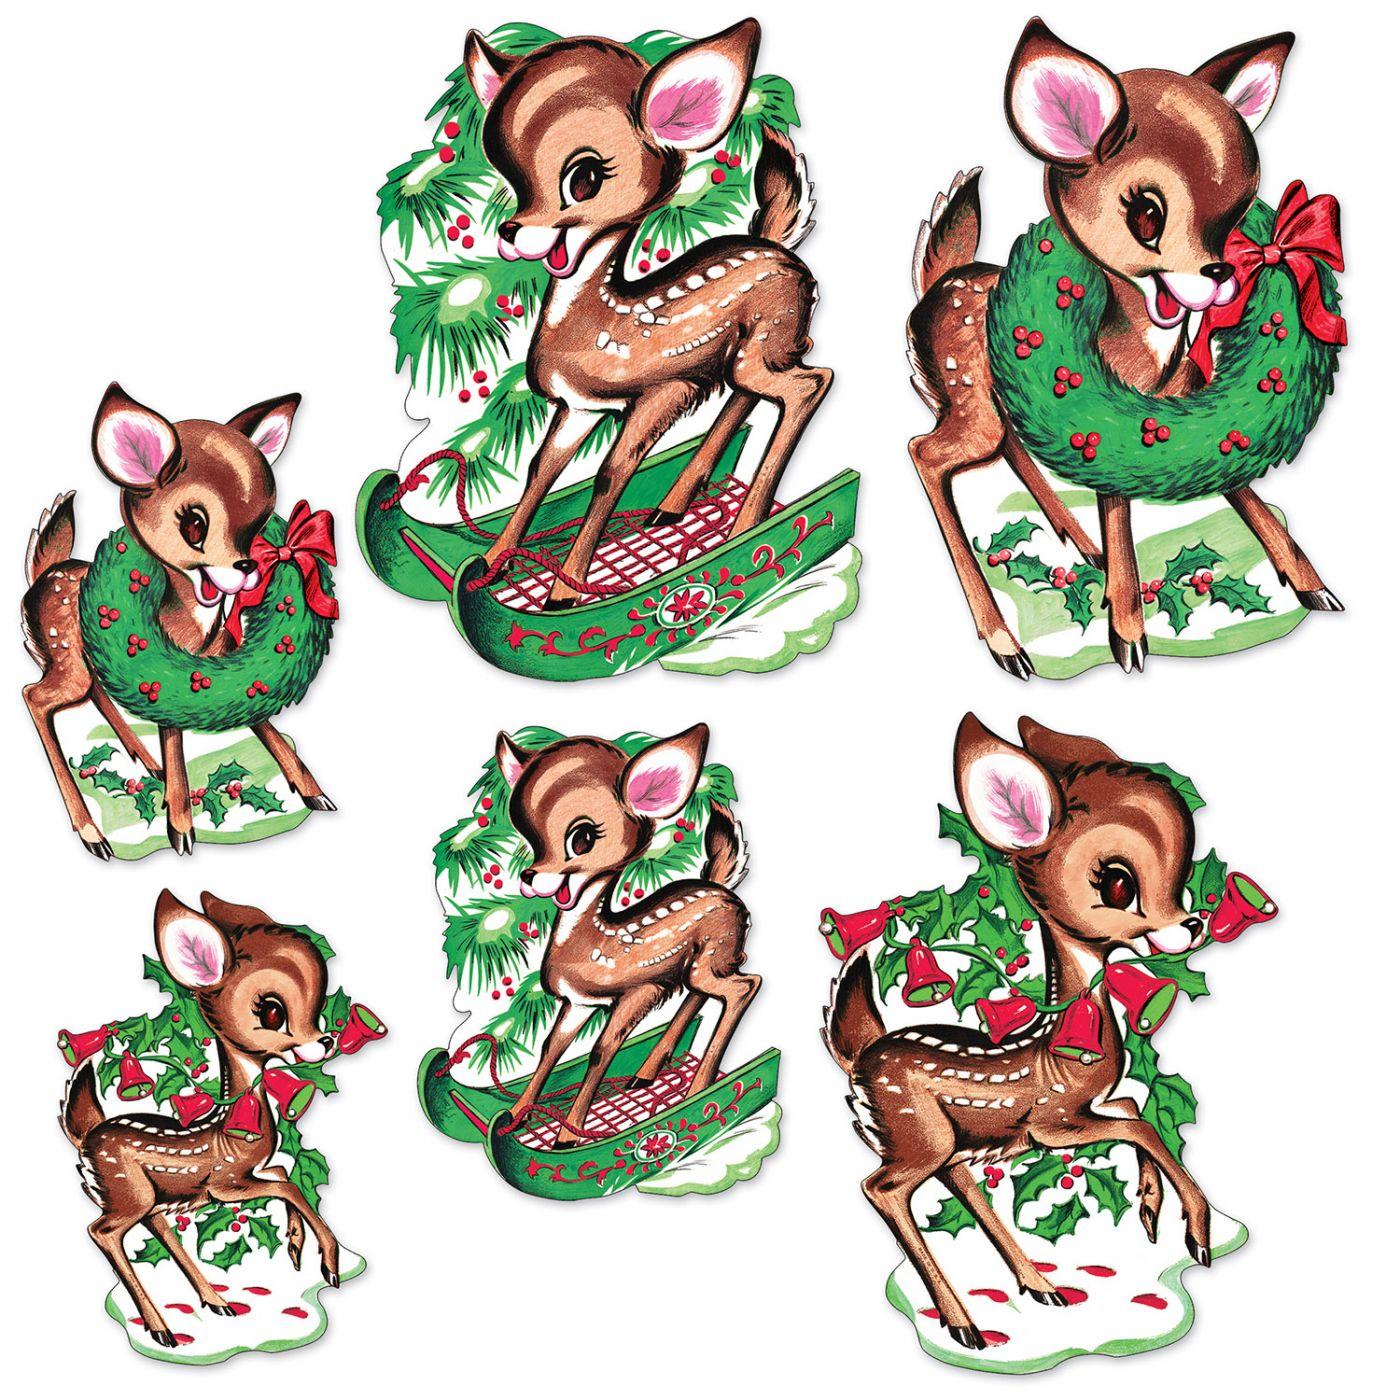 Vintage Christmas Reindeer Cutouts image